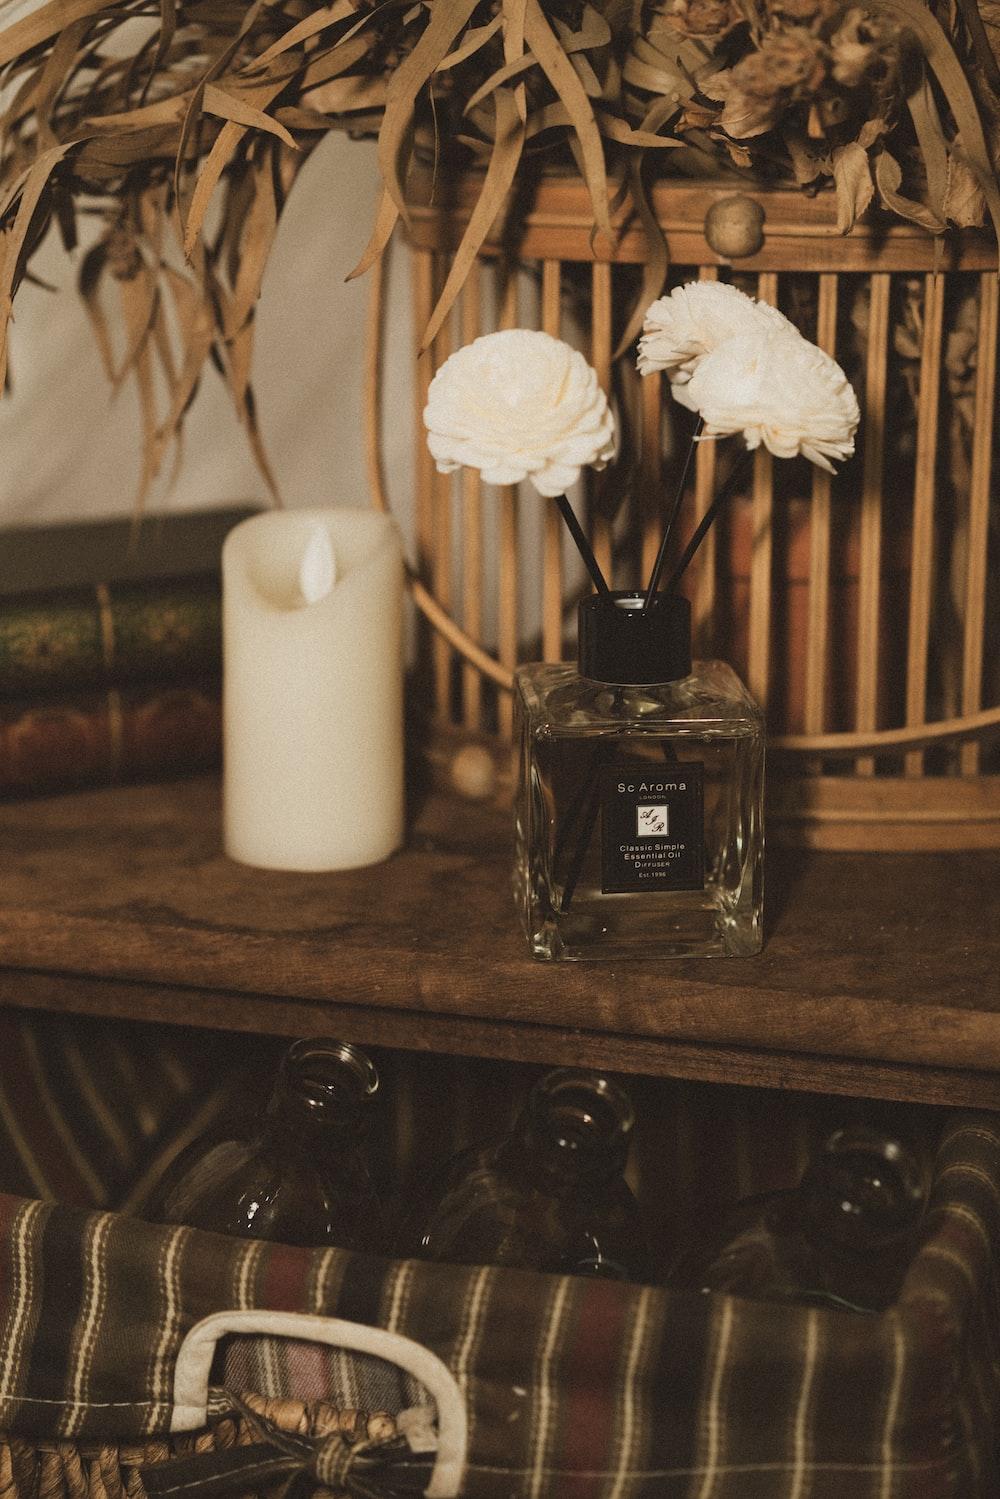 black glass perfume bottle on brown wooden shelf